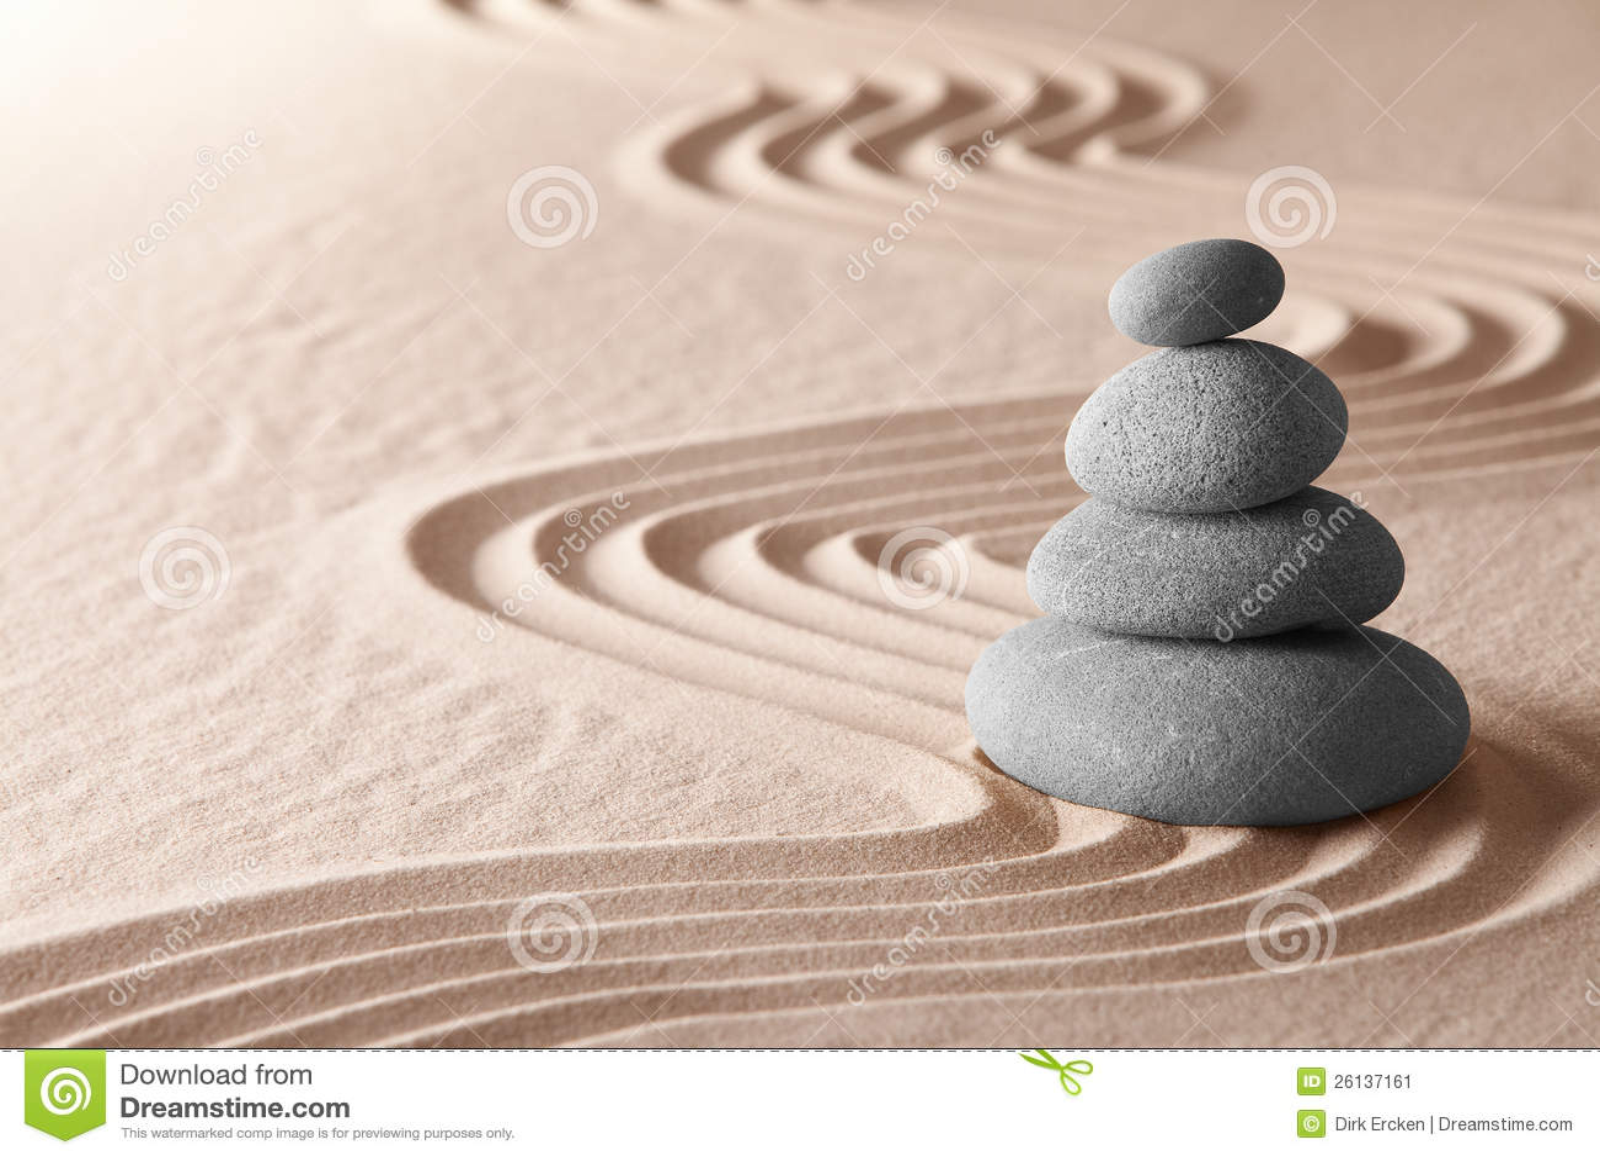 Japanese rock garden texture - Zen Meditation Garden Simplicity Harmony Stock Image